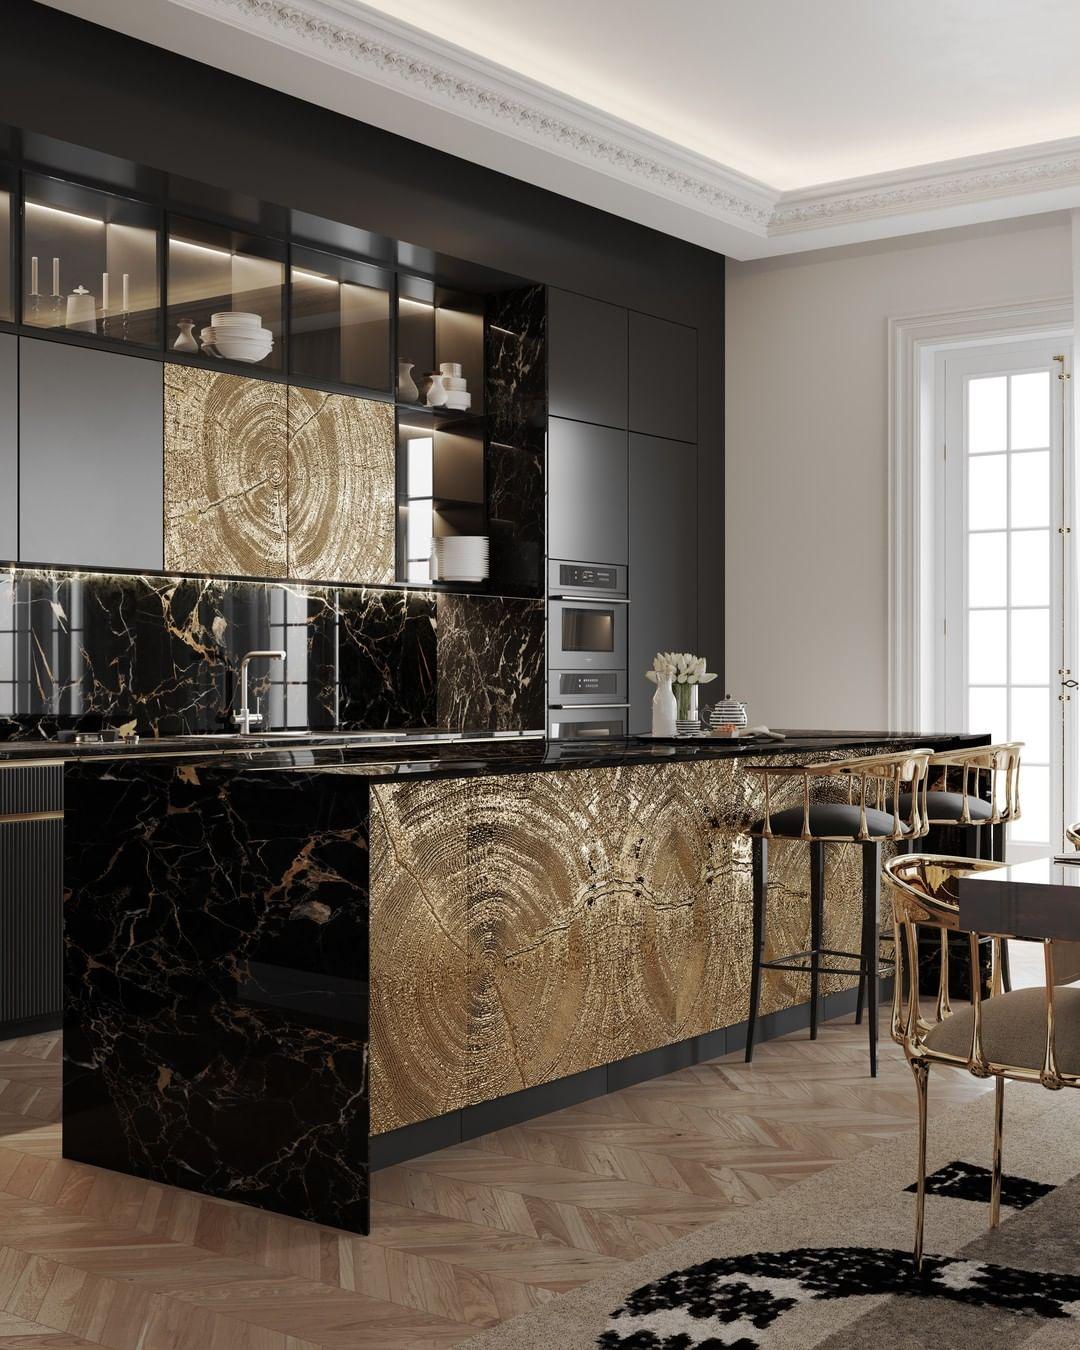 kitchen decor ideas Modern Kitchen Decor Ideas For 2021 modern kitchen decor ideas for 2021 1